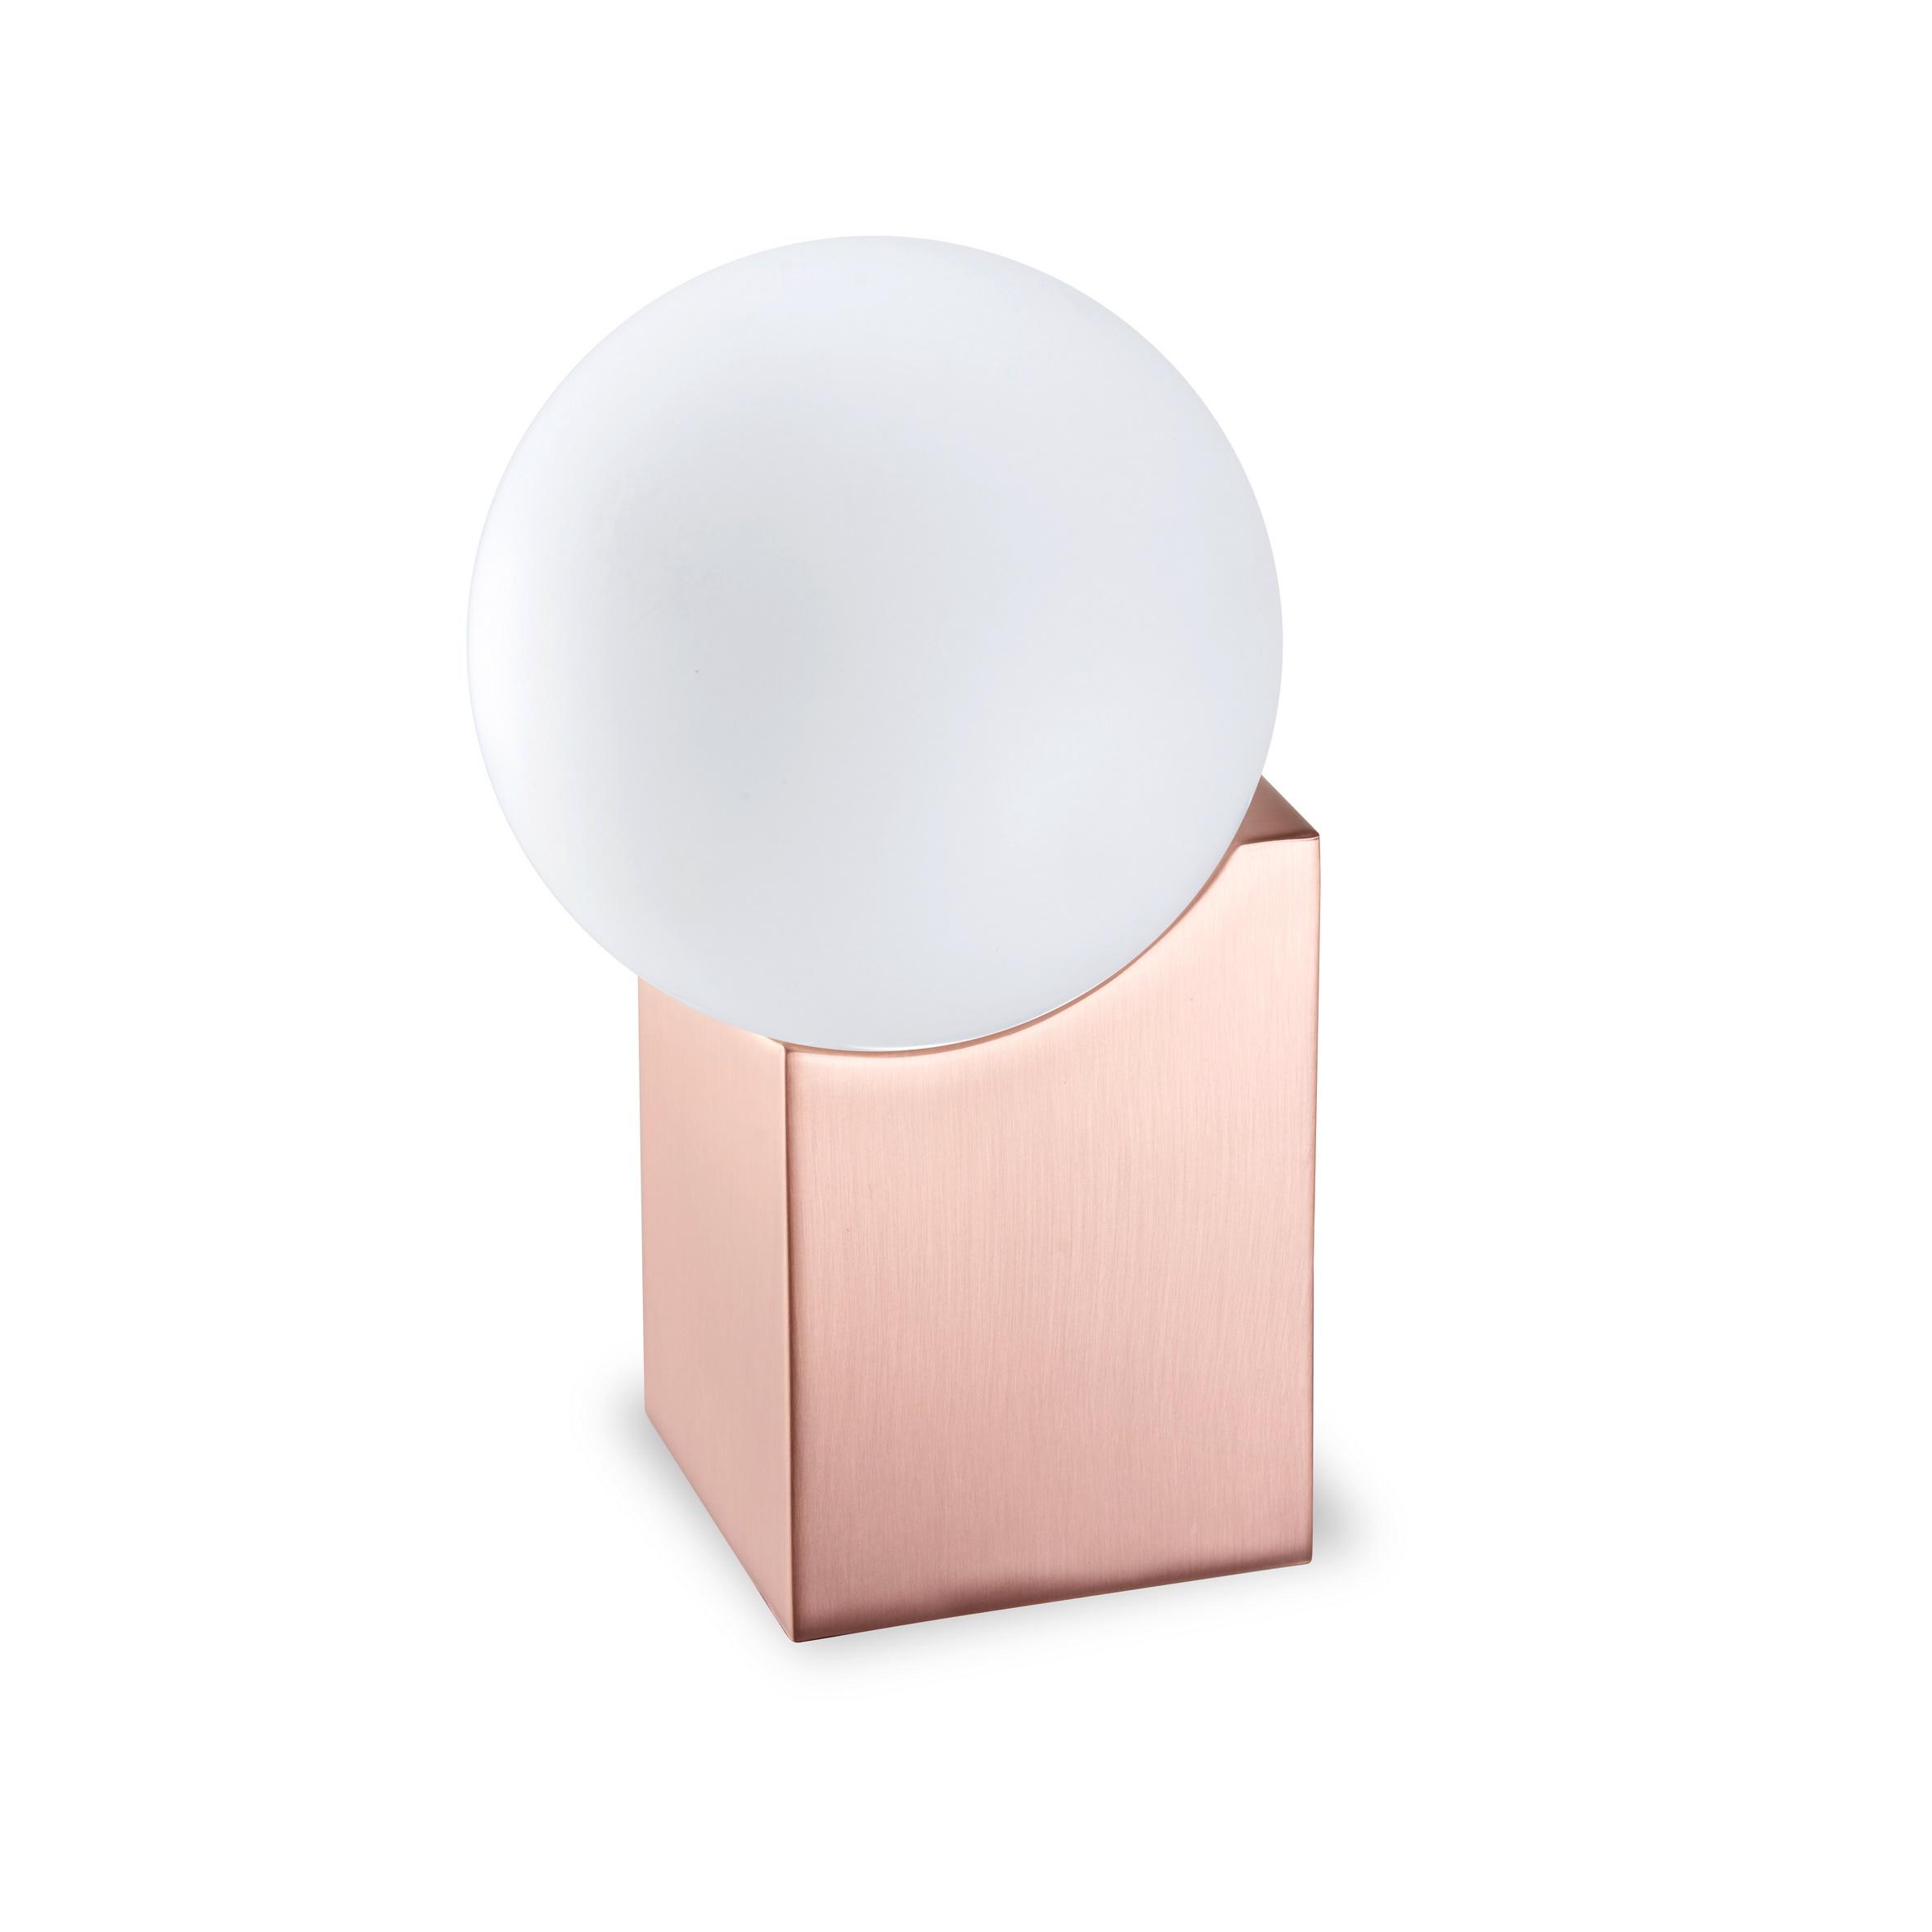 Cub Sobremesa pequeño G-9 LED Acero y cristal 17,5cm Cobre satinado